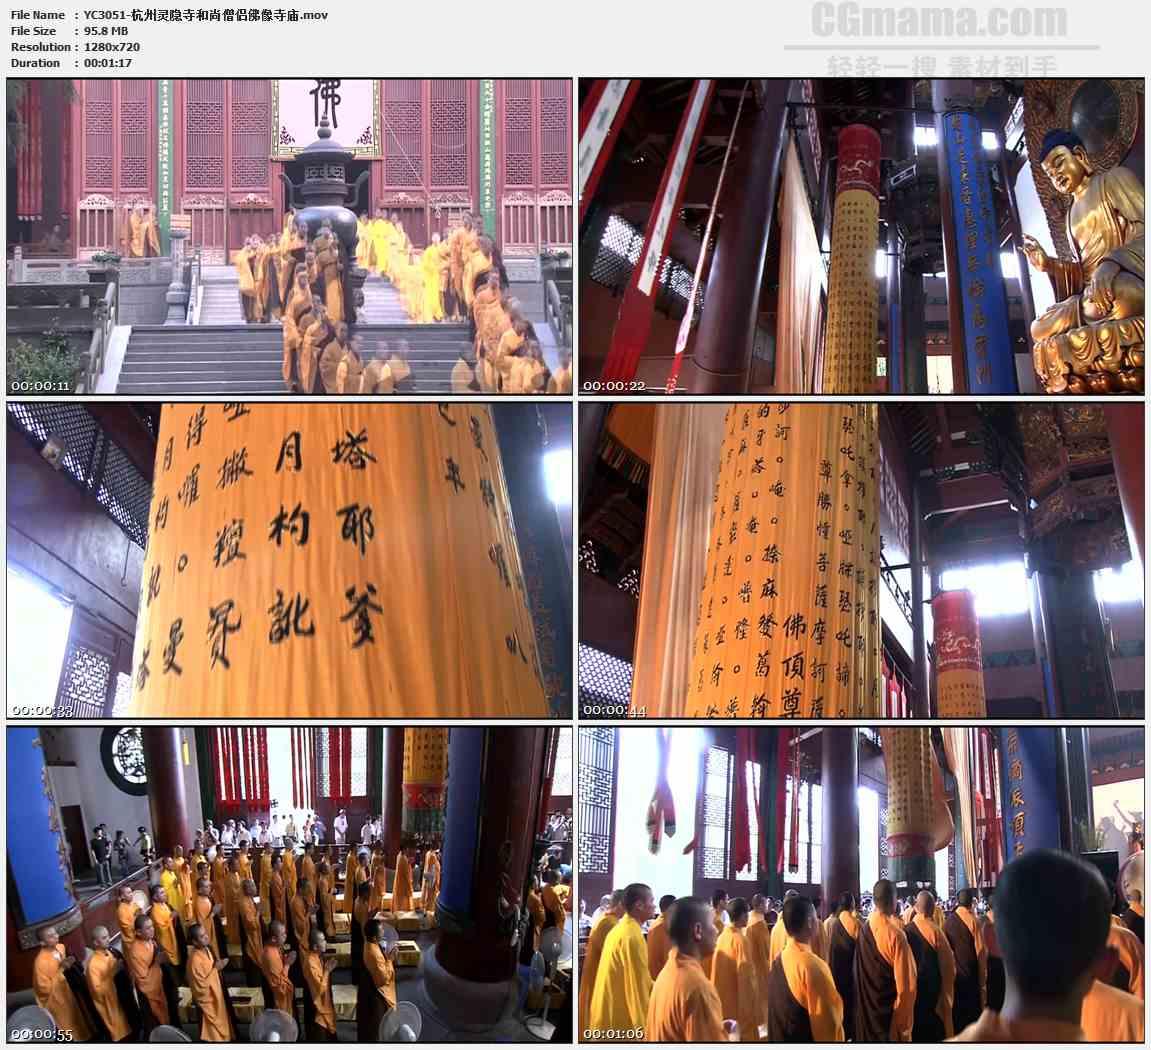 YC3051-杭州灵隐寺和尚僧侣佛像寺庙高清实拍视频素材